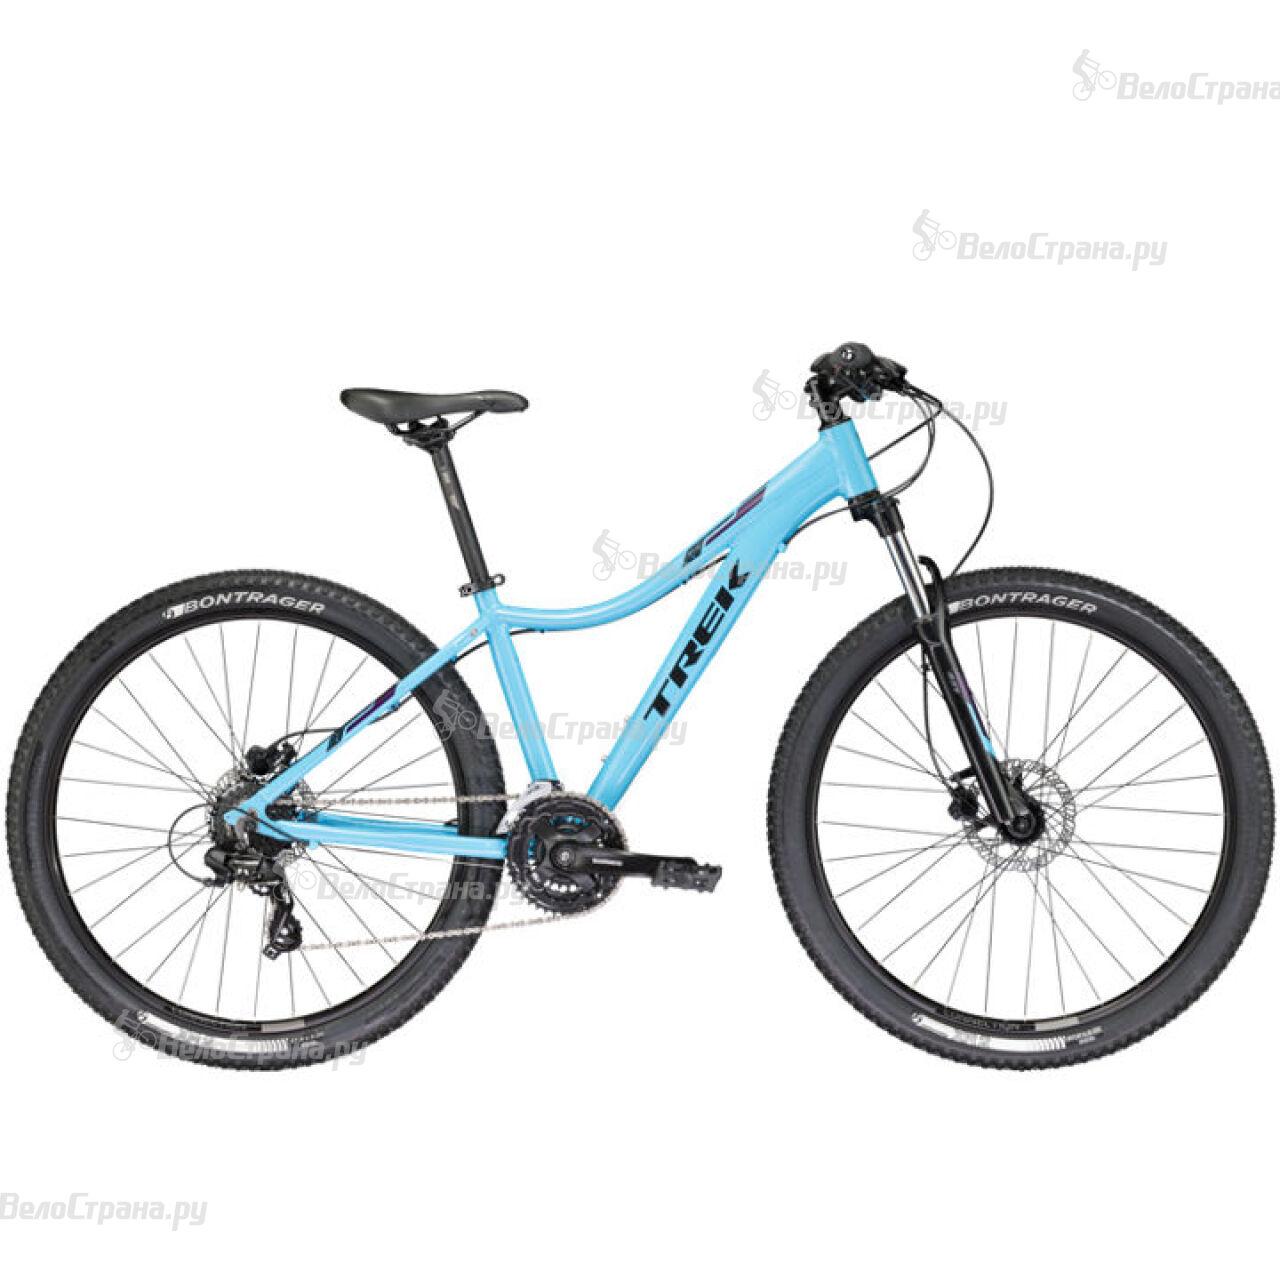 все цены на Велосипед Trek Skye SL WSD 27,5 (2017) онлайн